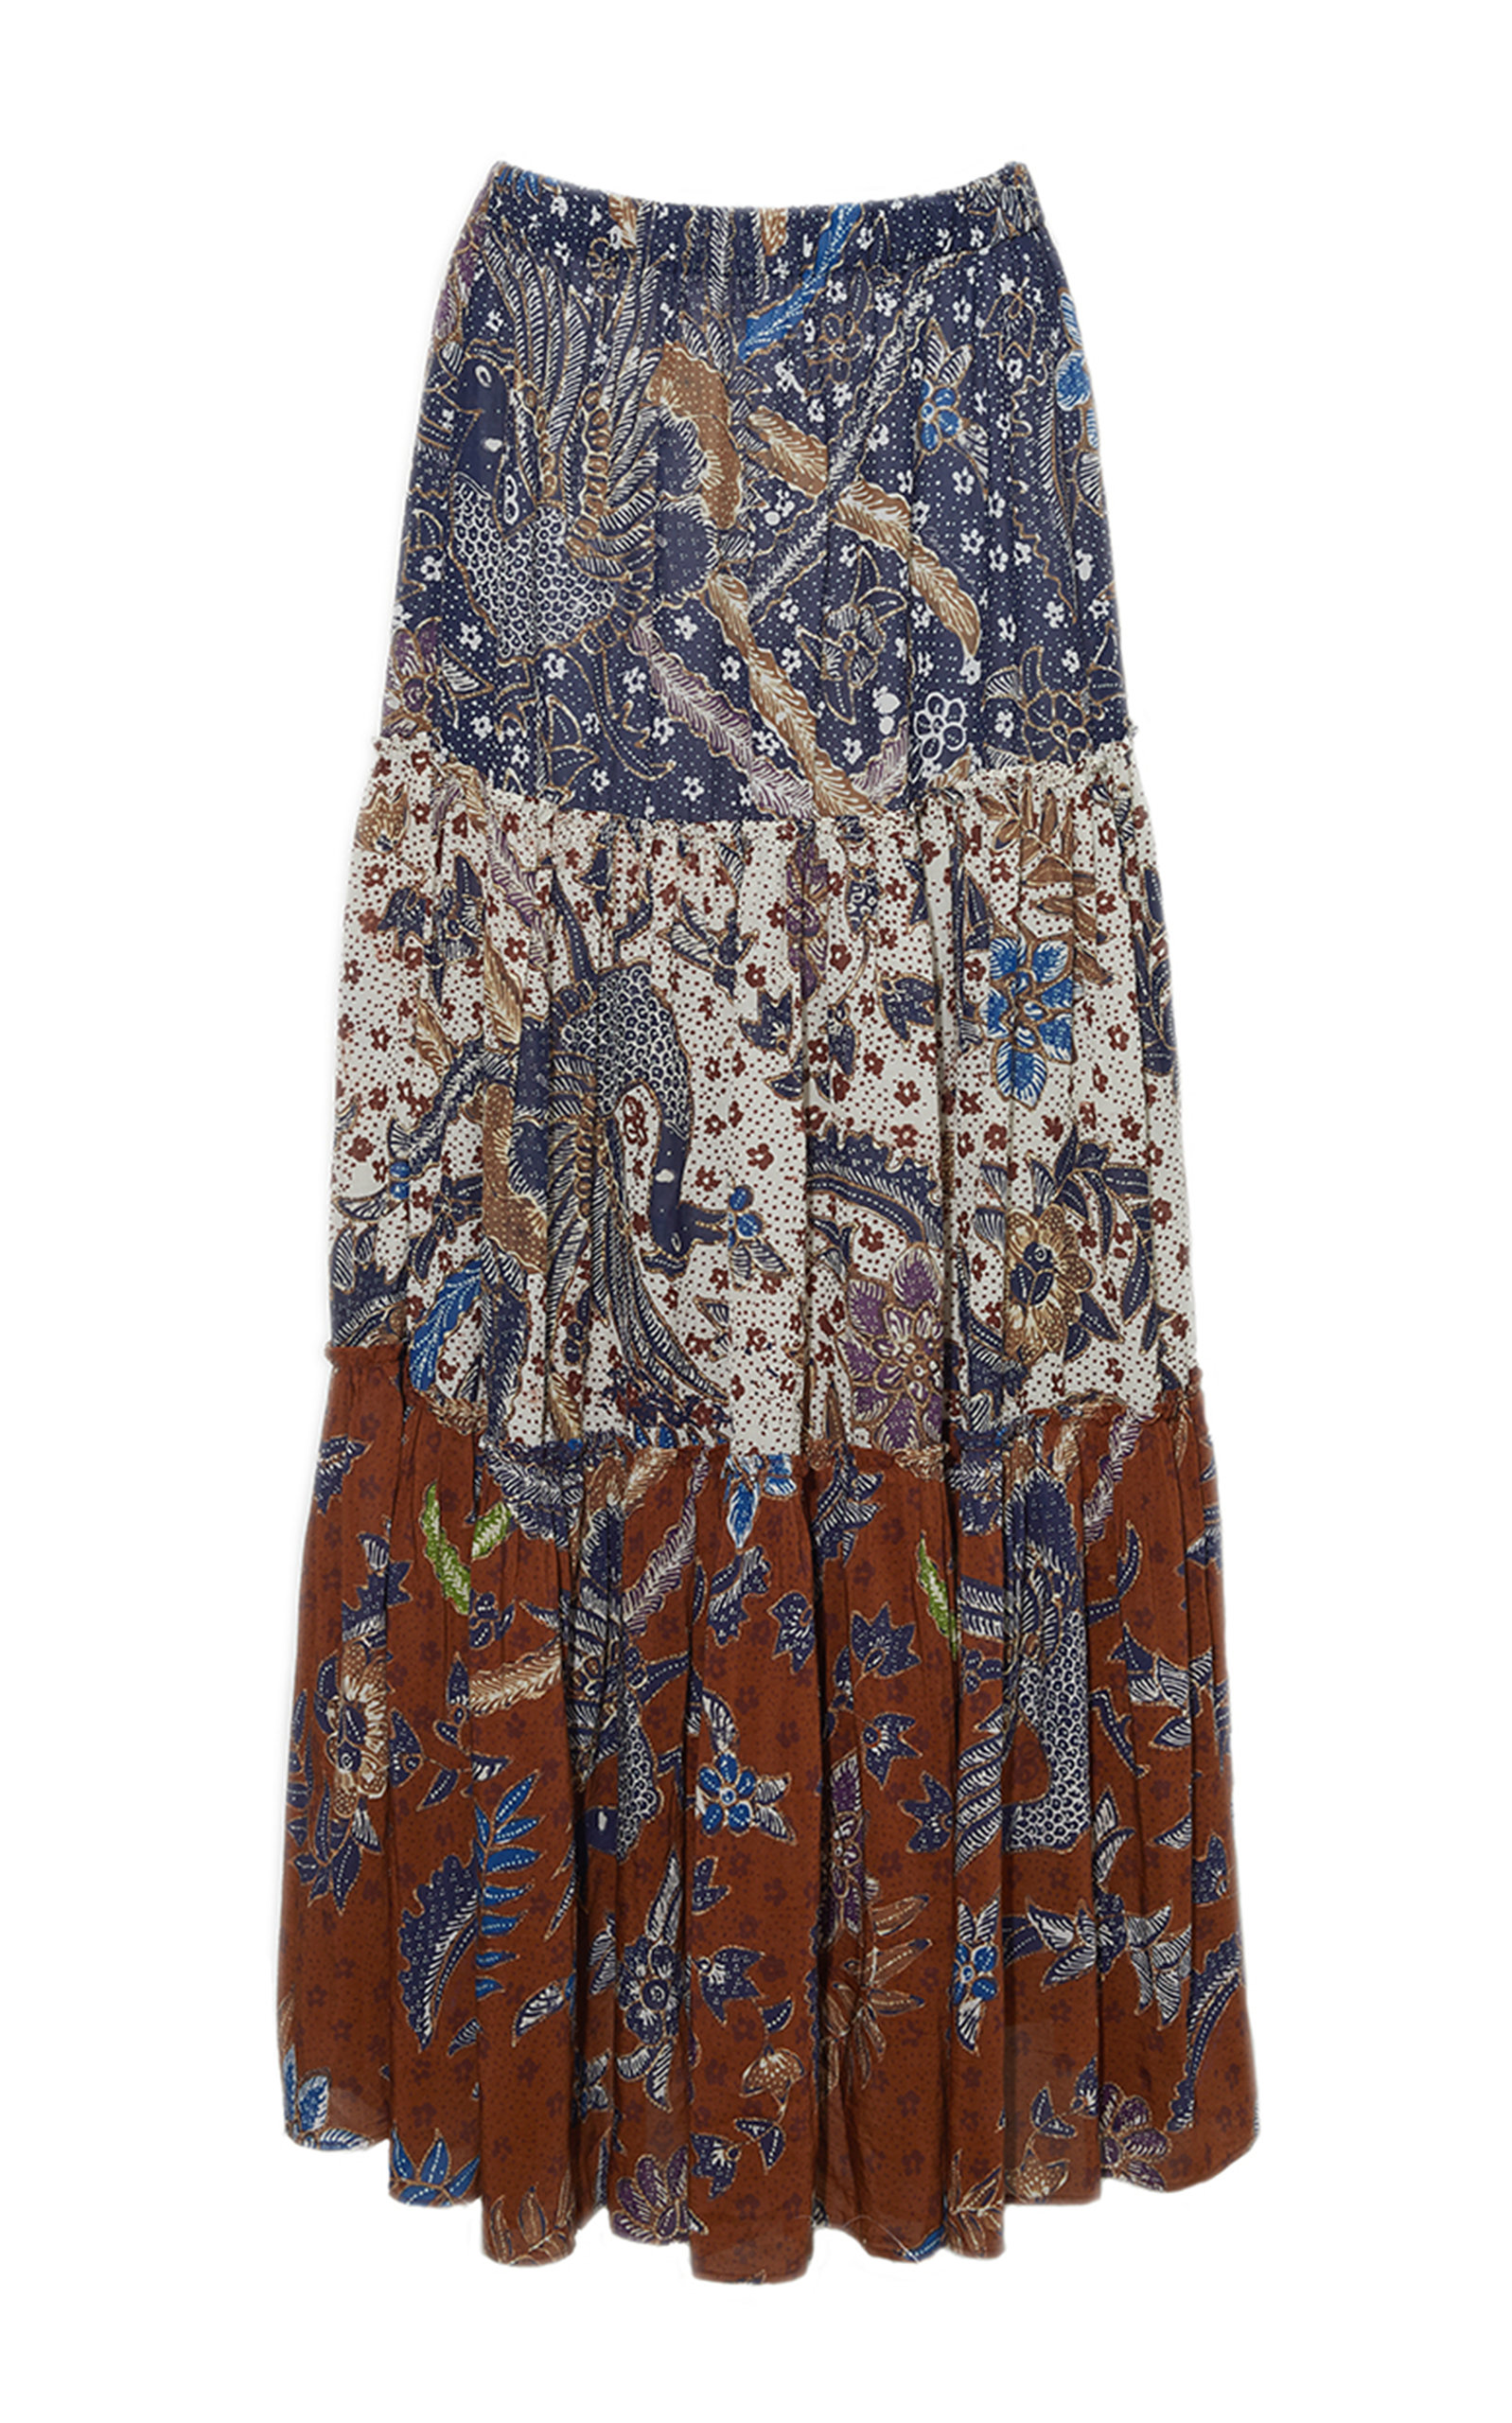 Women's Melanie Tiered Cotton Voile Midi Skirt